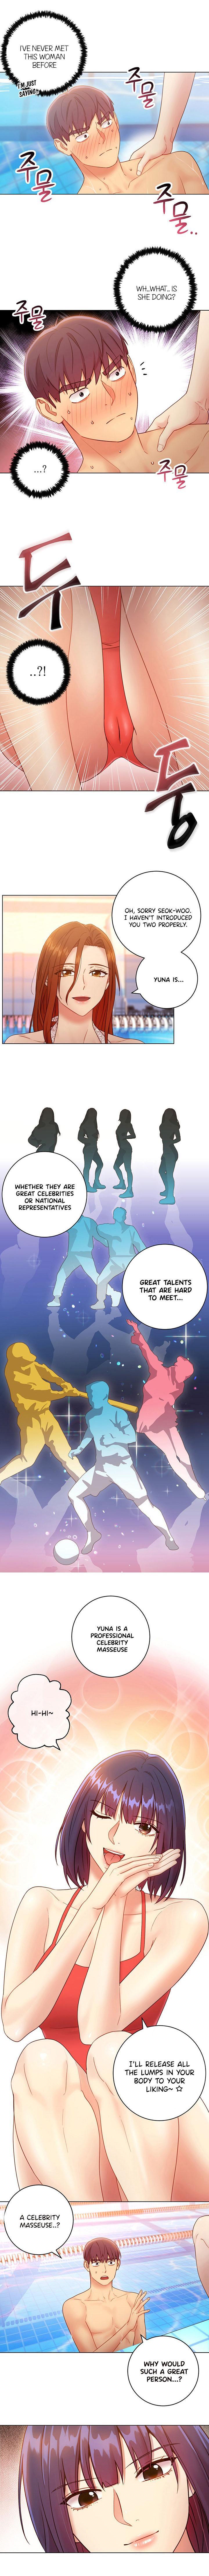 [Neck Pilllow] Stepmother Friends Ch.40/? [English] [Hentai Universe] NEW! 22/10/2020 323